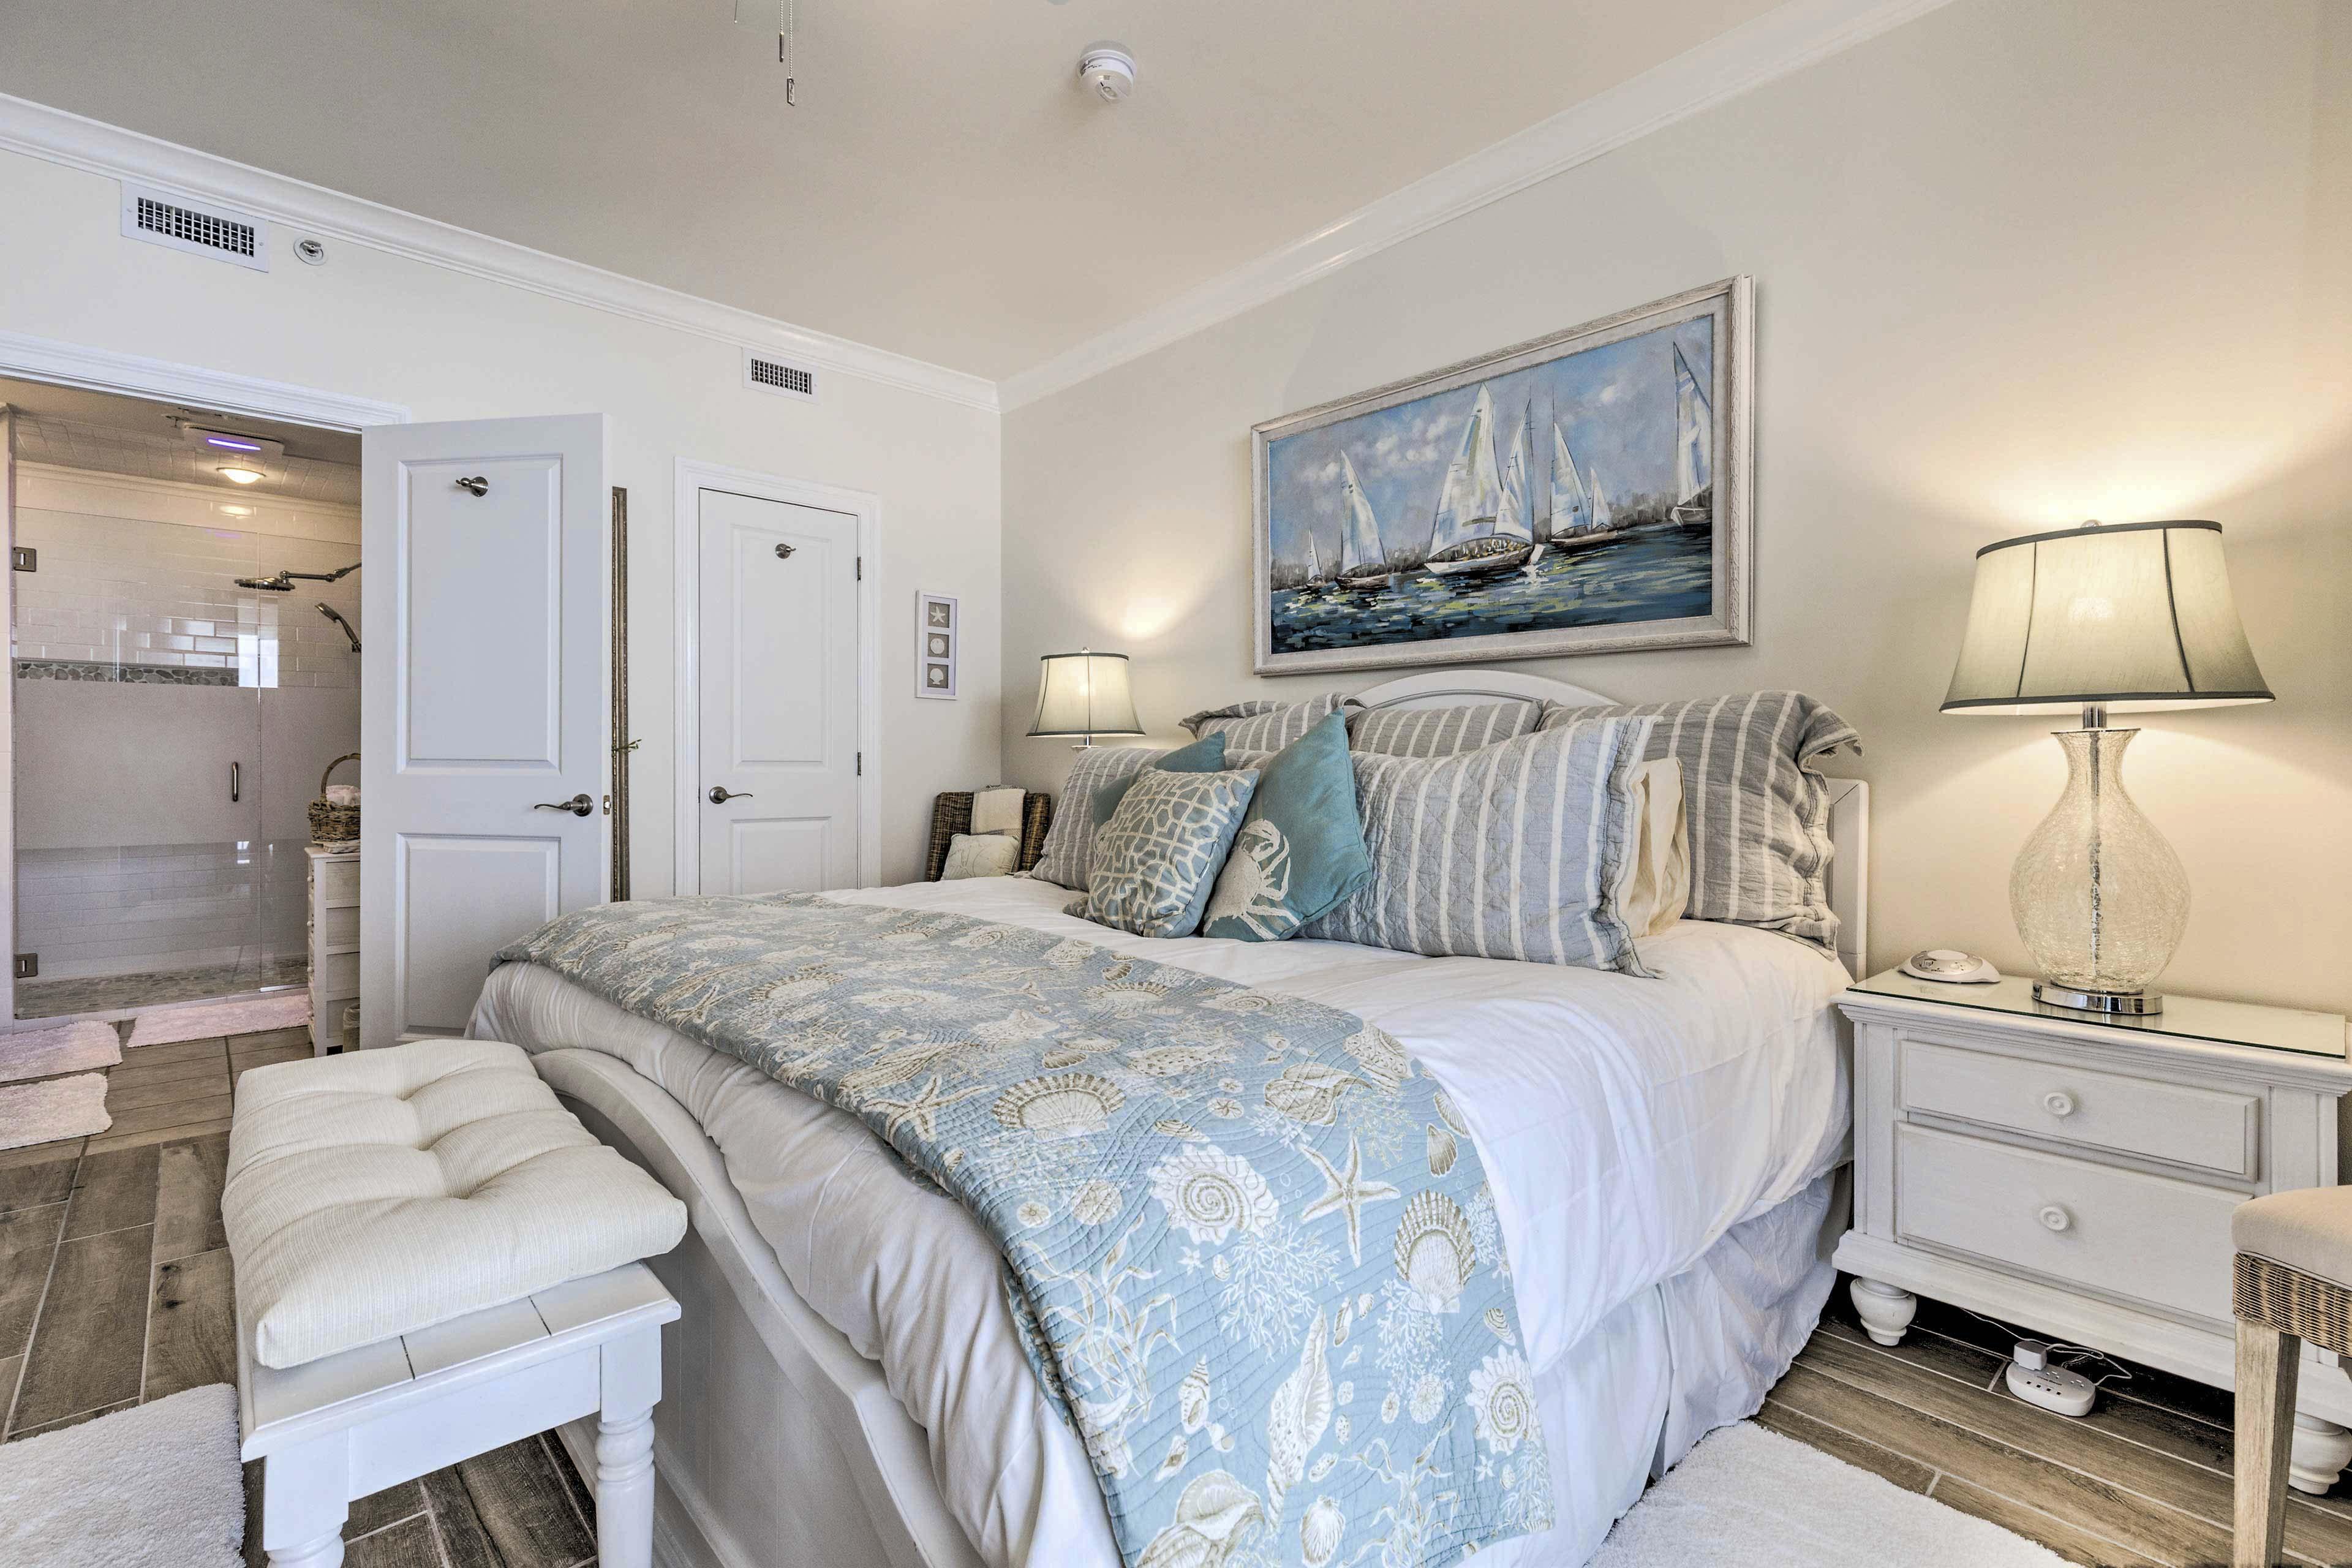 Master Bedroom | Full En-Suite Bathroom